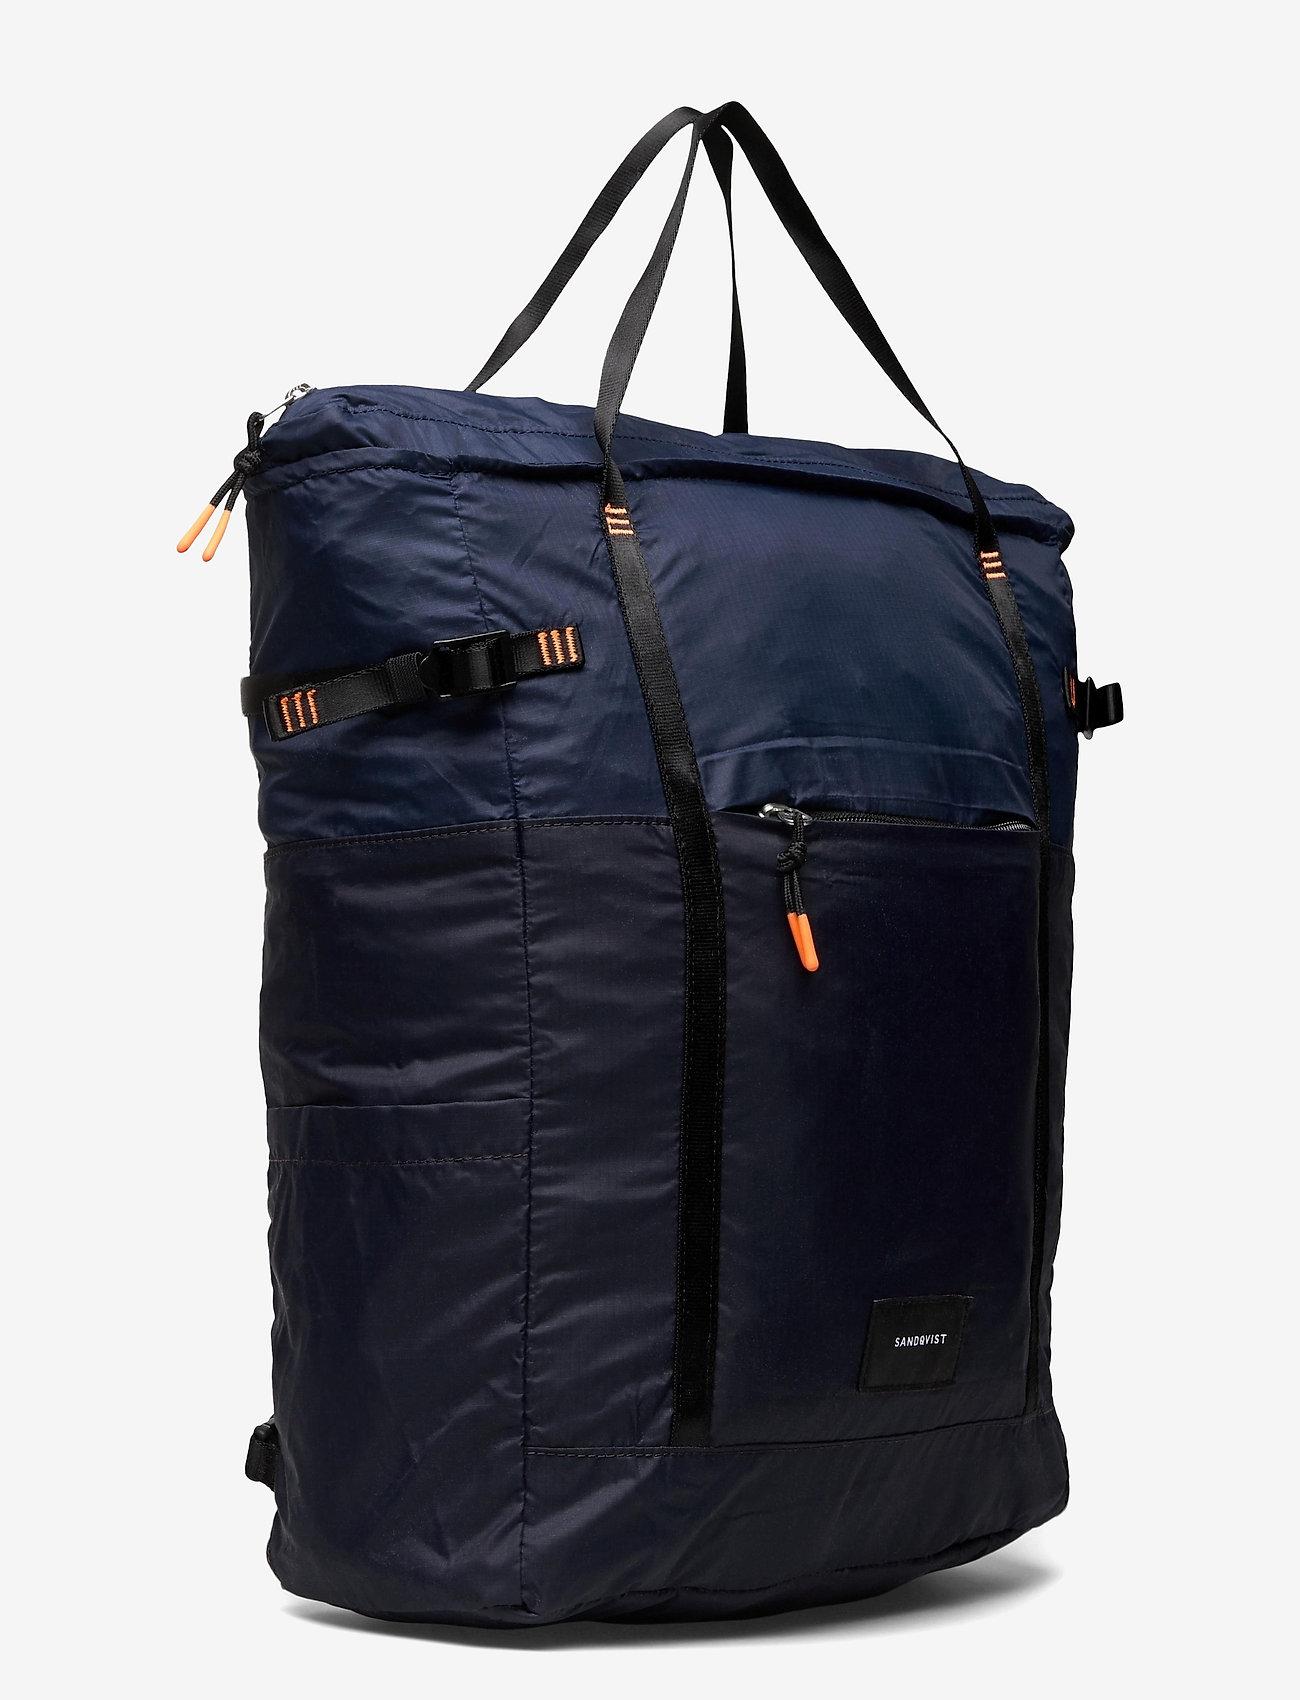 SANDQVIST - ROGER LIGHTWEIGHT - tassen - multi navy blue/evening blue - 2